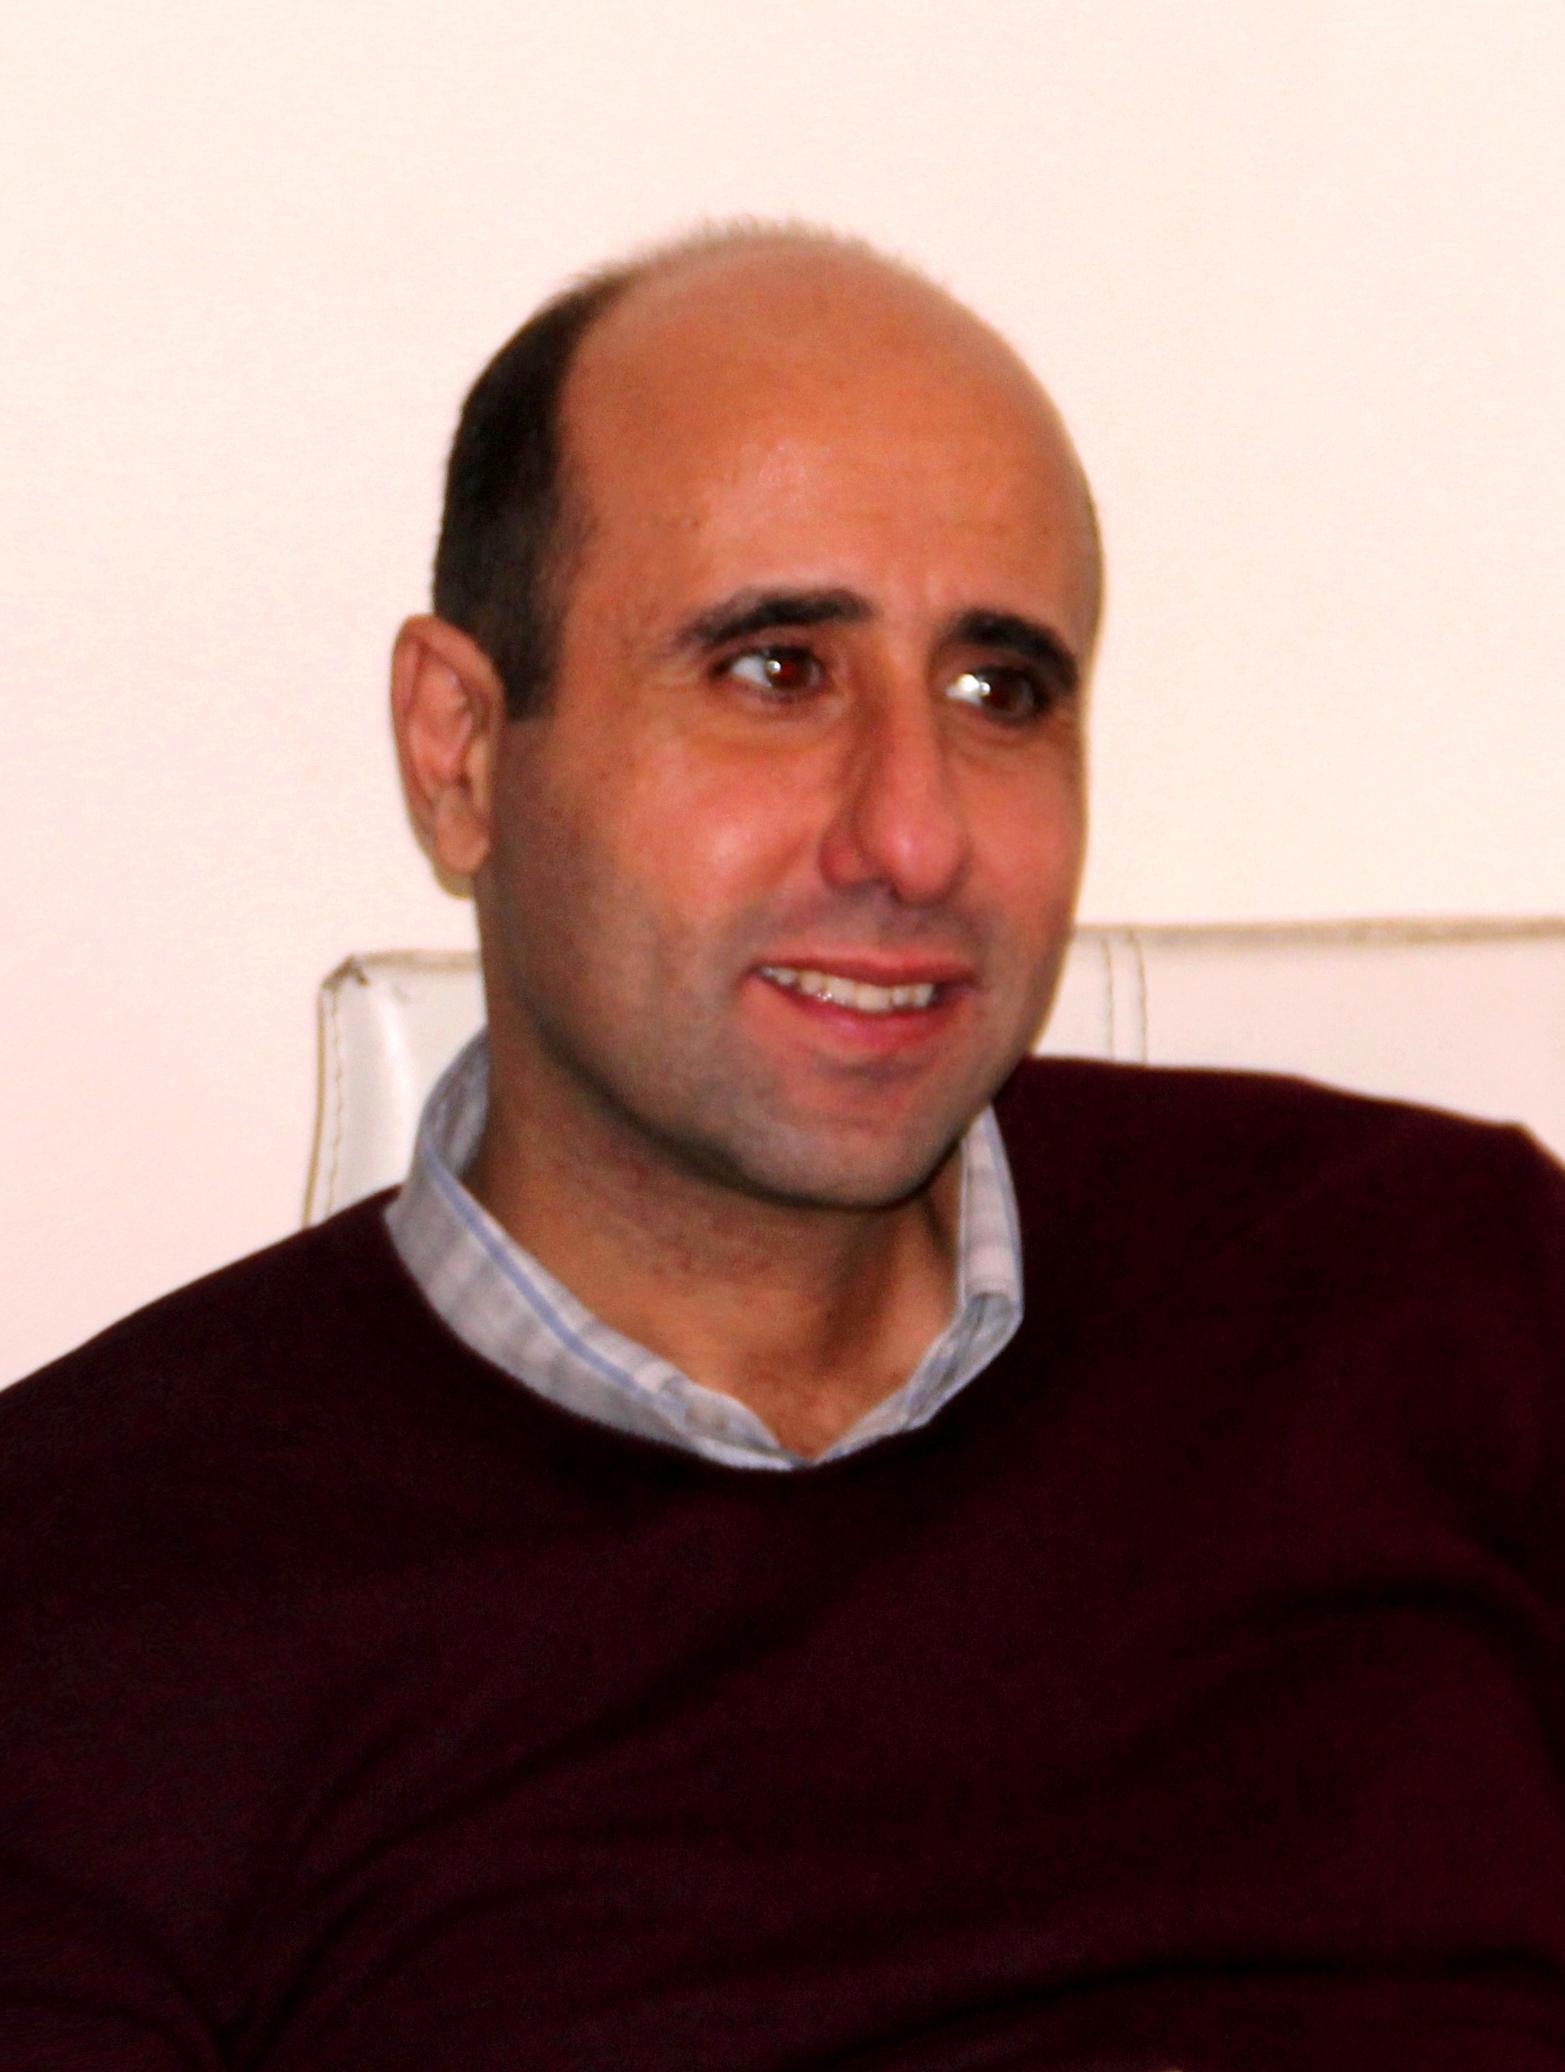 Bassel Abdallah Large - 3